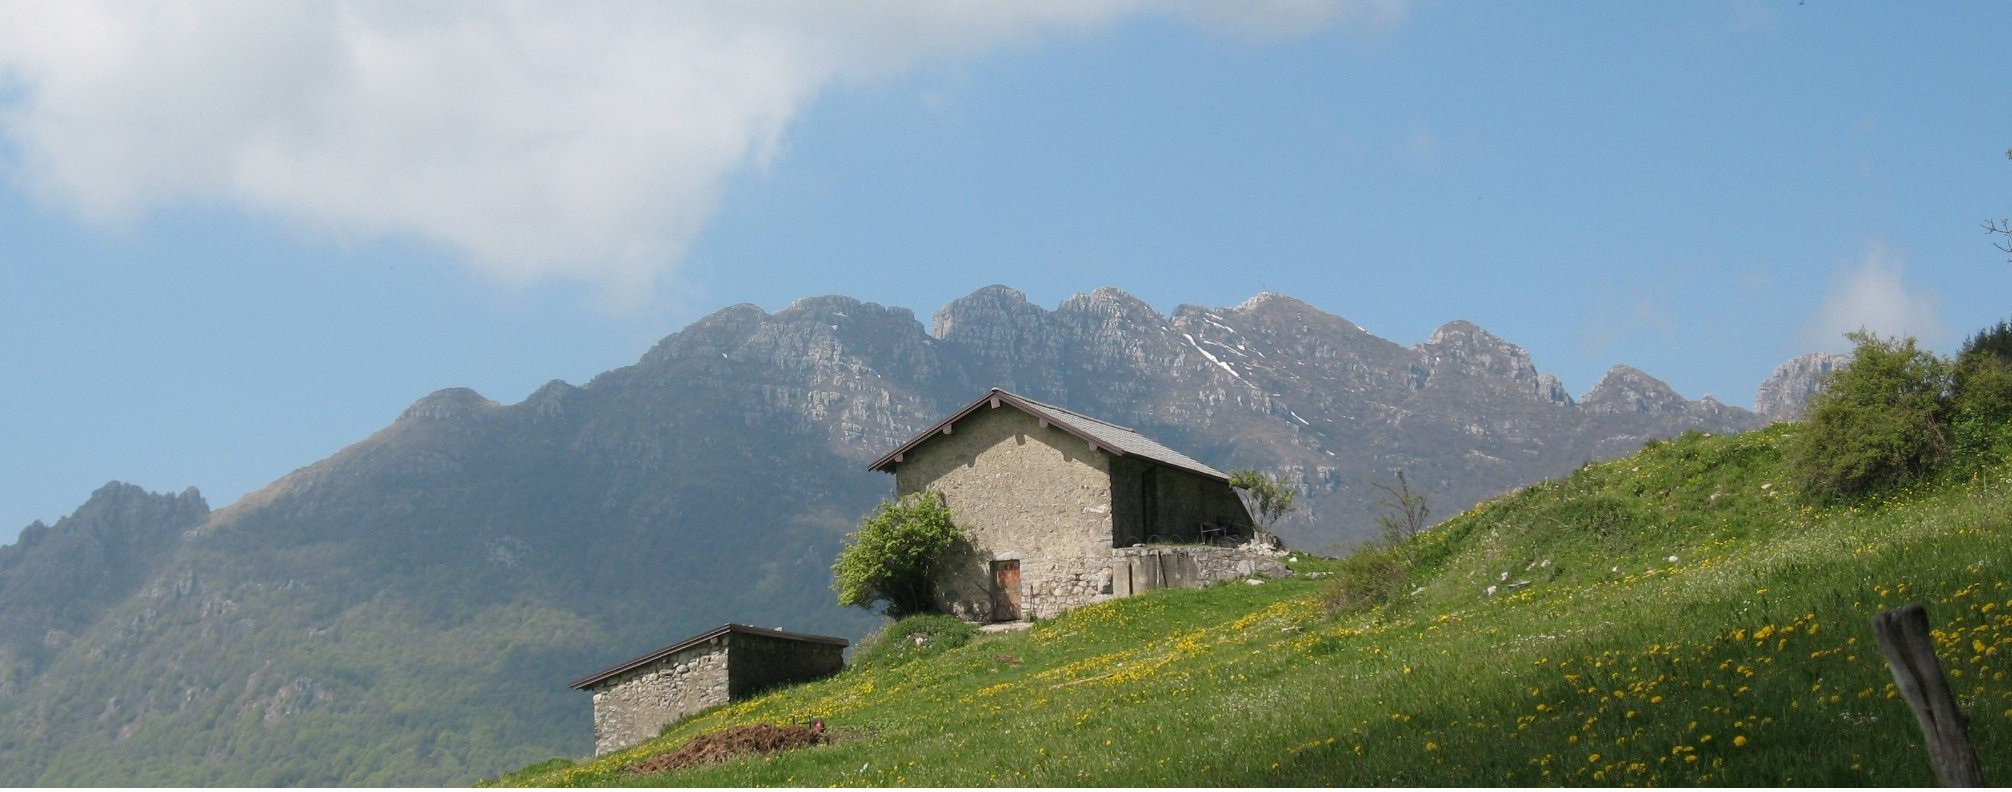 Il rifugio for Rifugio resegone valle imagna